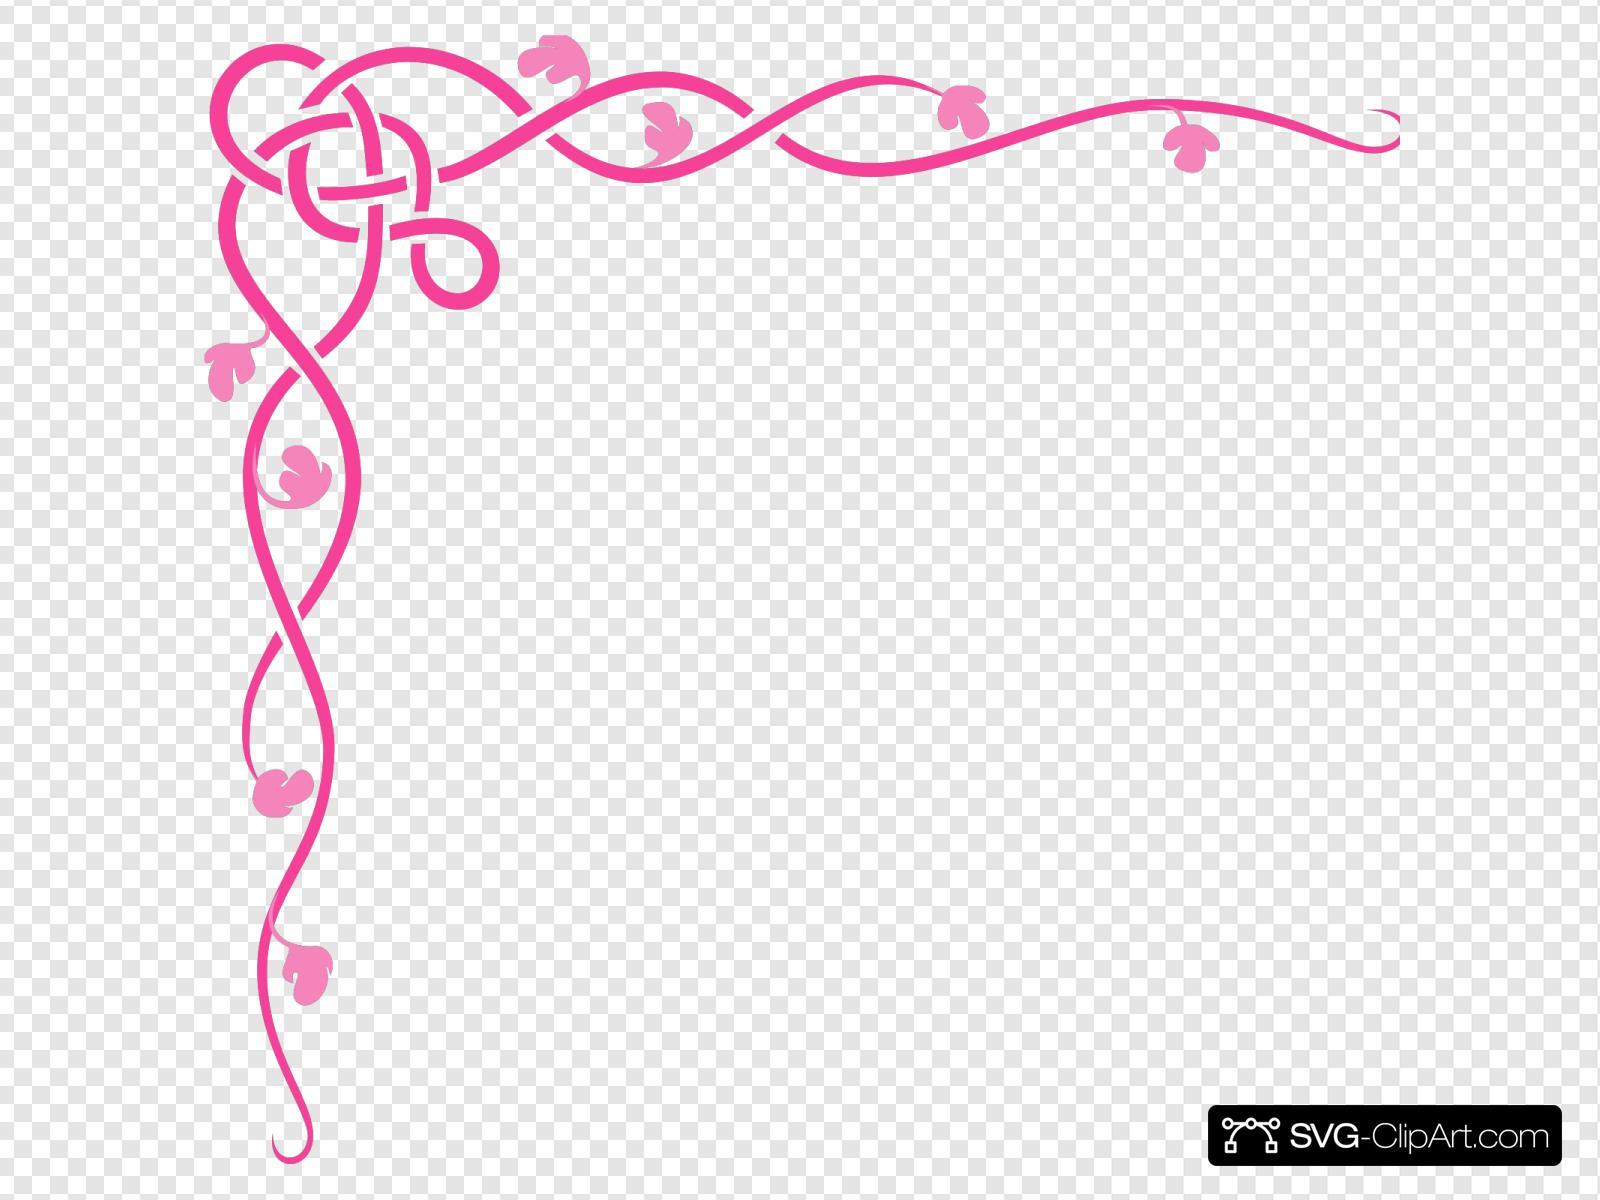 Bordure Svg Vector Bordure Clip Art Svg Clipart